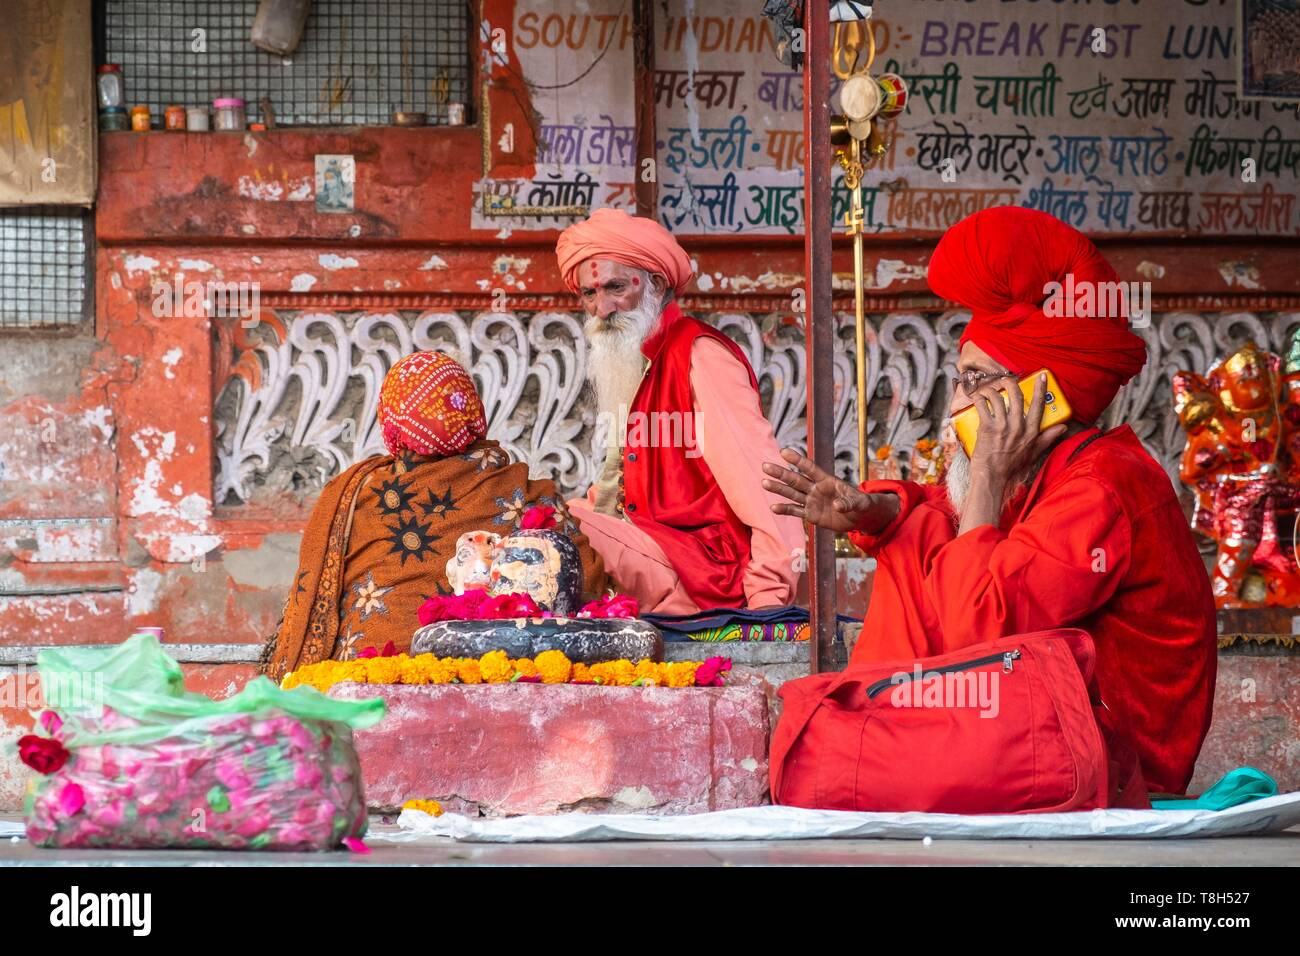 India, Rajasthan, Pushkar, holy city for Hindus, saddhus at the foot of Brahma (or Jagatpita Brahma) temple - Stock Image